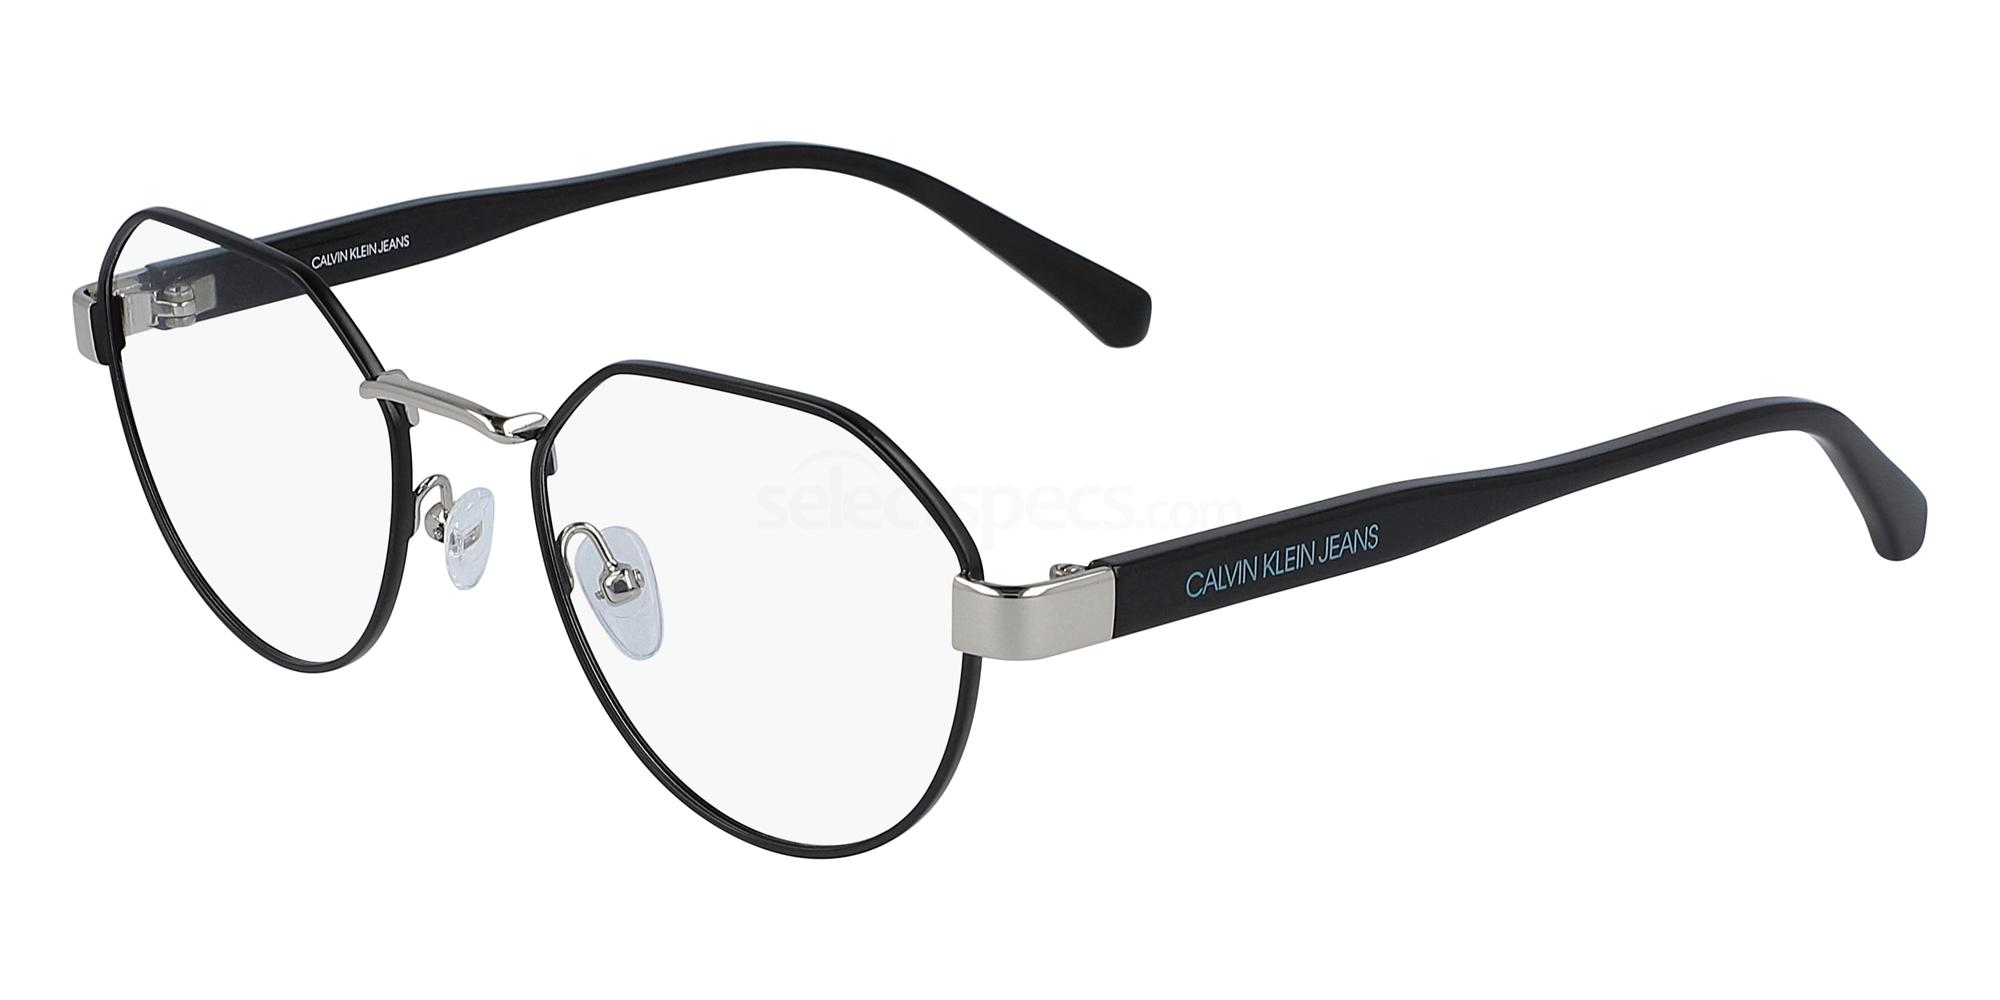 001 CKJ19300 Glasses, Calvin Klein Jeans